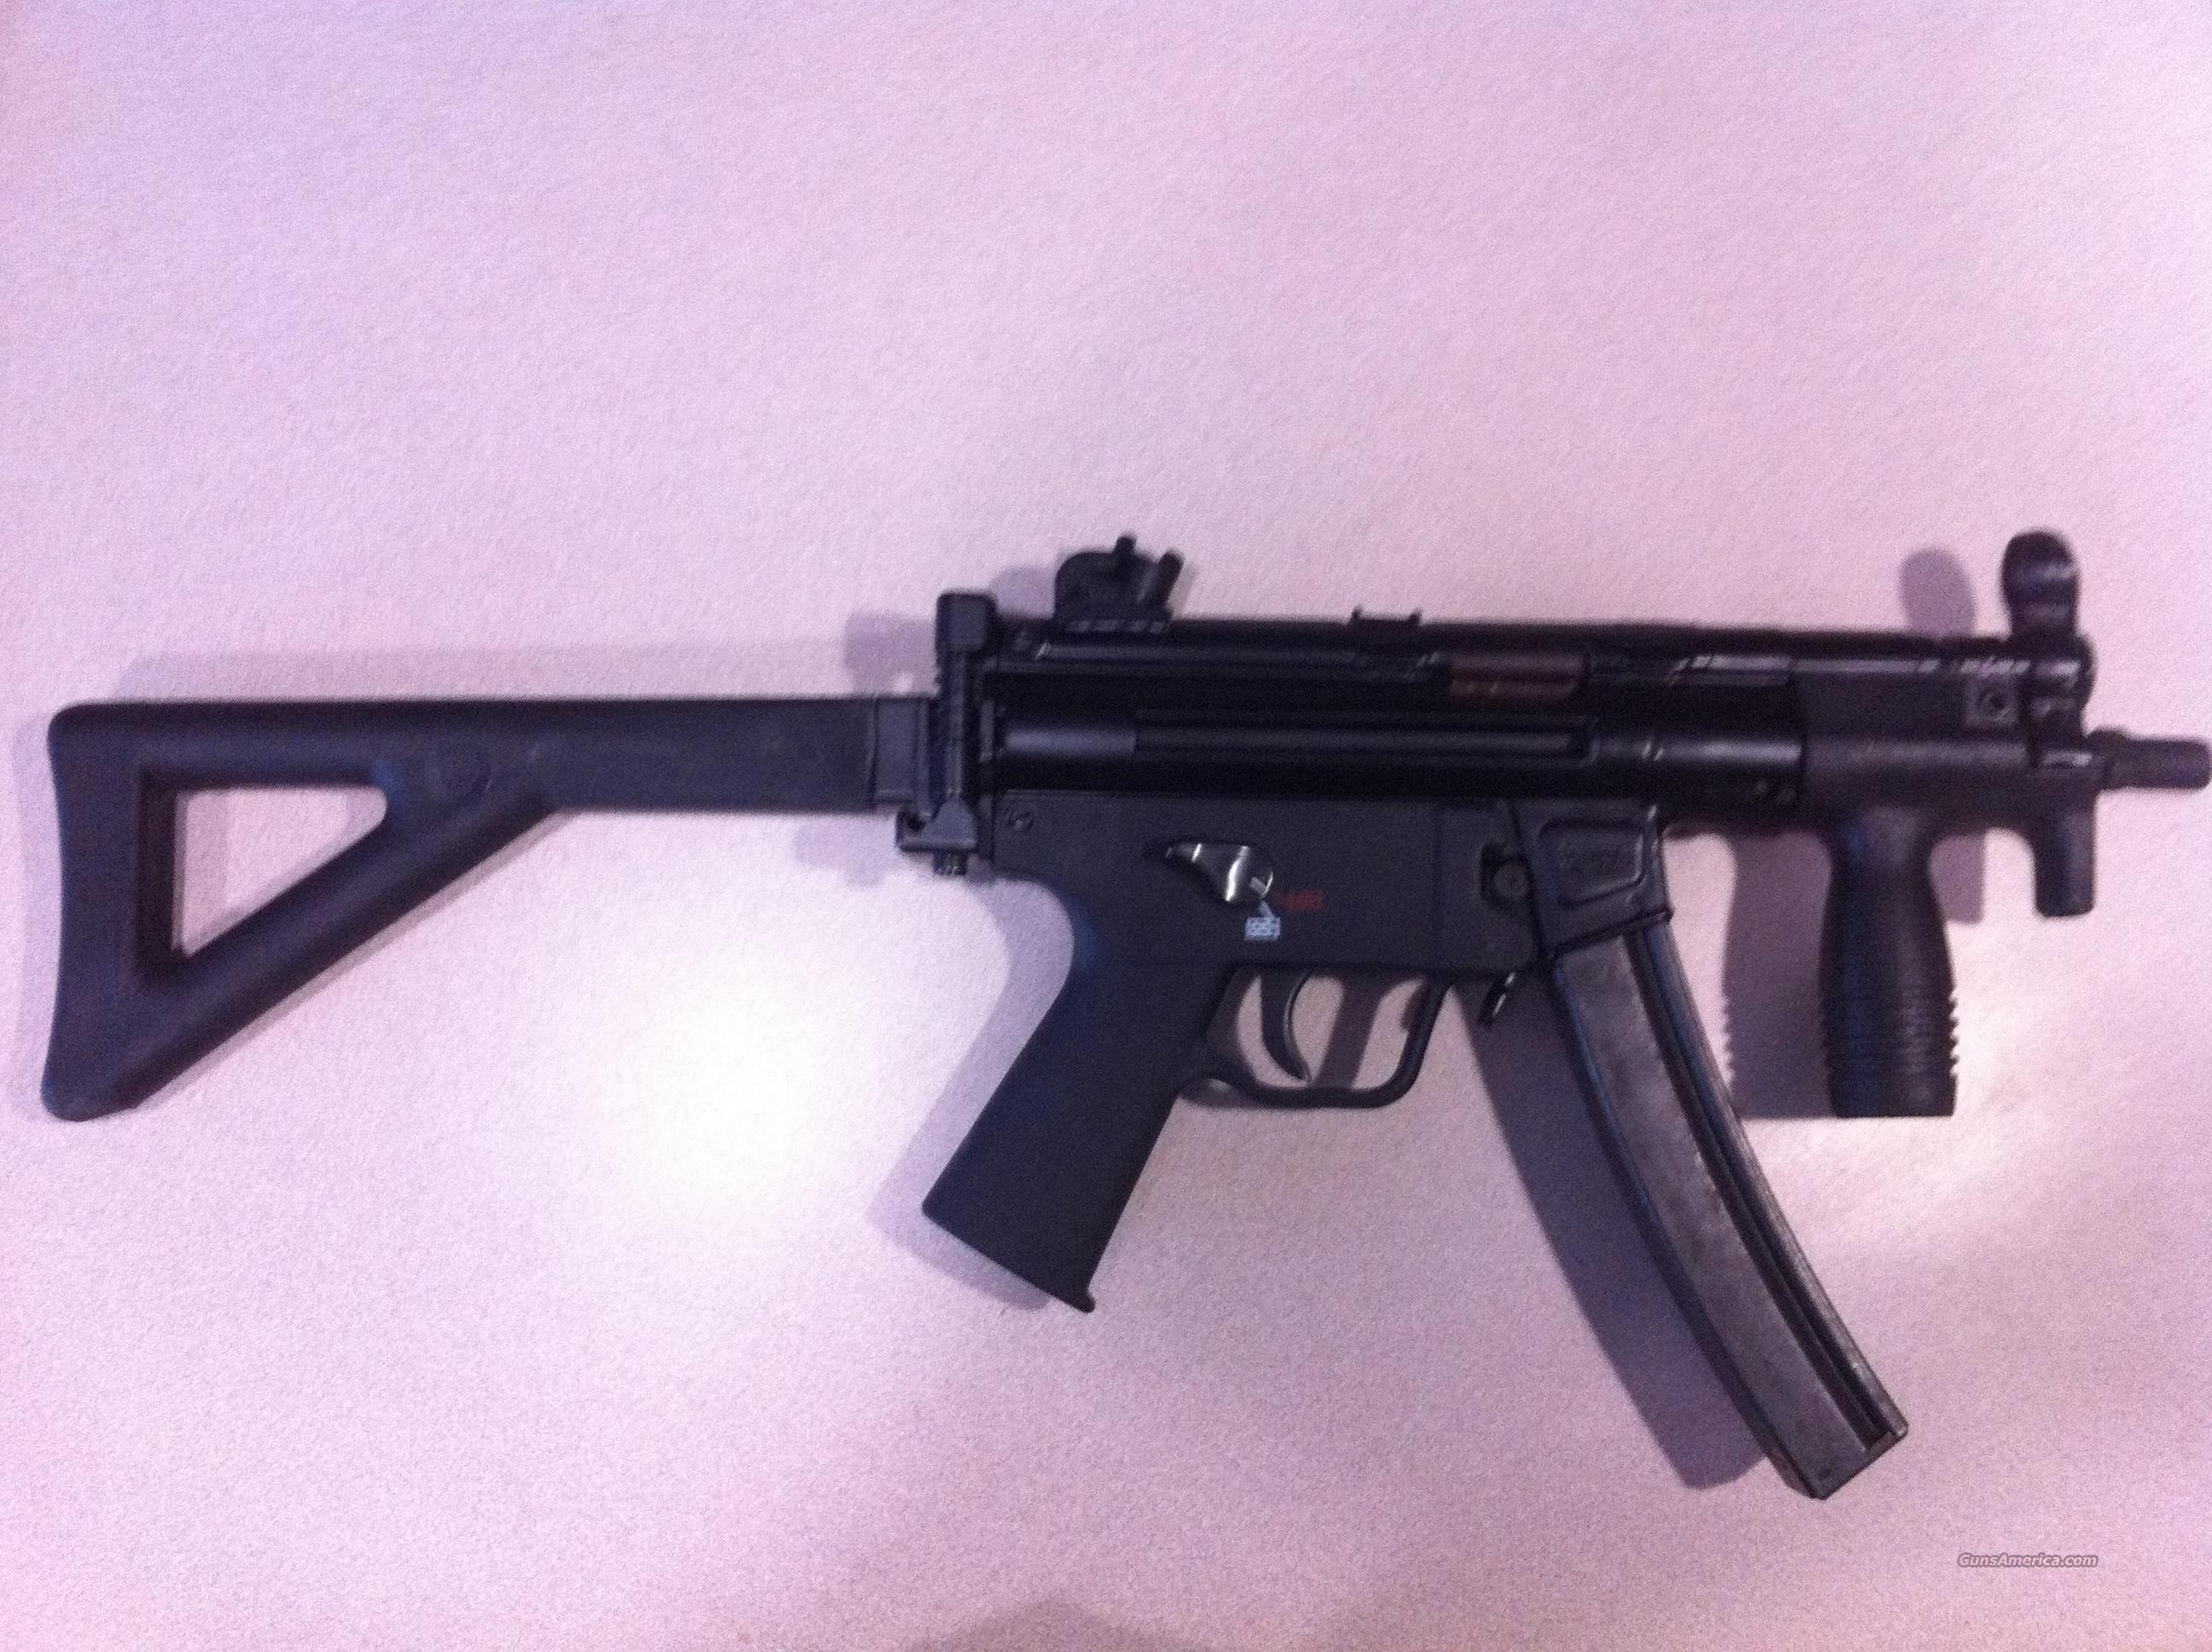 MP5 CA94  9MM HK MP5 COHARIE ARMS PDW CLONE, TACTICAL VERSION; VECTOR SW MKE, NOT LWRC, BUSHMASTER, POF, SOCOM,  Guns > Rifles > Heckler & Koch Rifles > Tactical